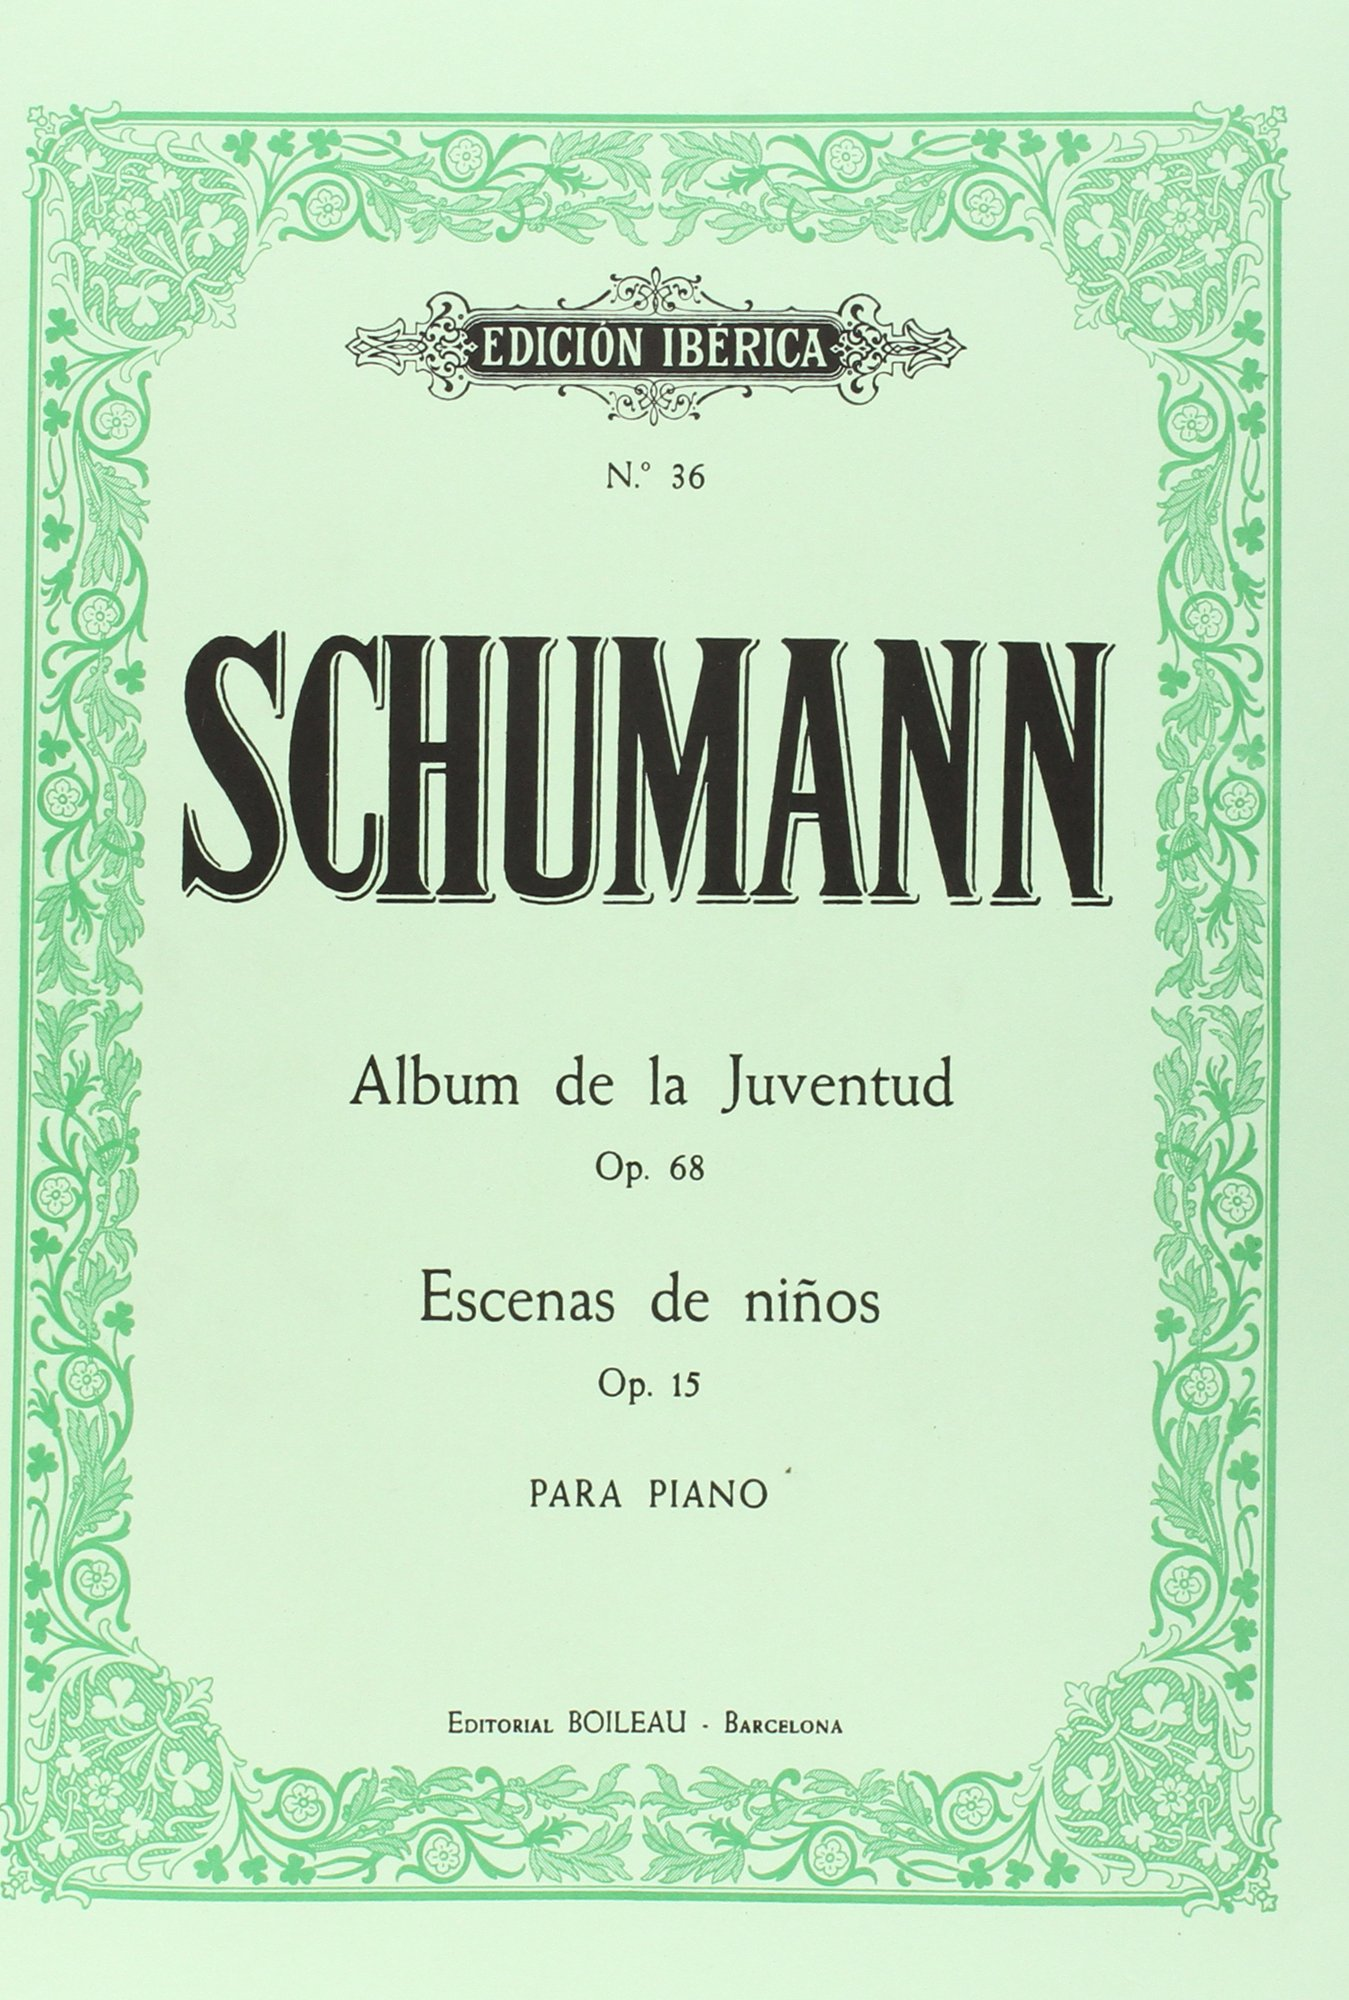 Album de la Juventud Op.68 / Escenas de ni�os Op.15: Robert Schumann: 9788480203470: Amazon.com: Books